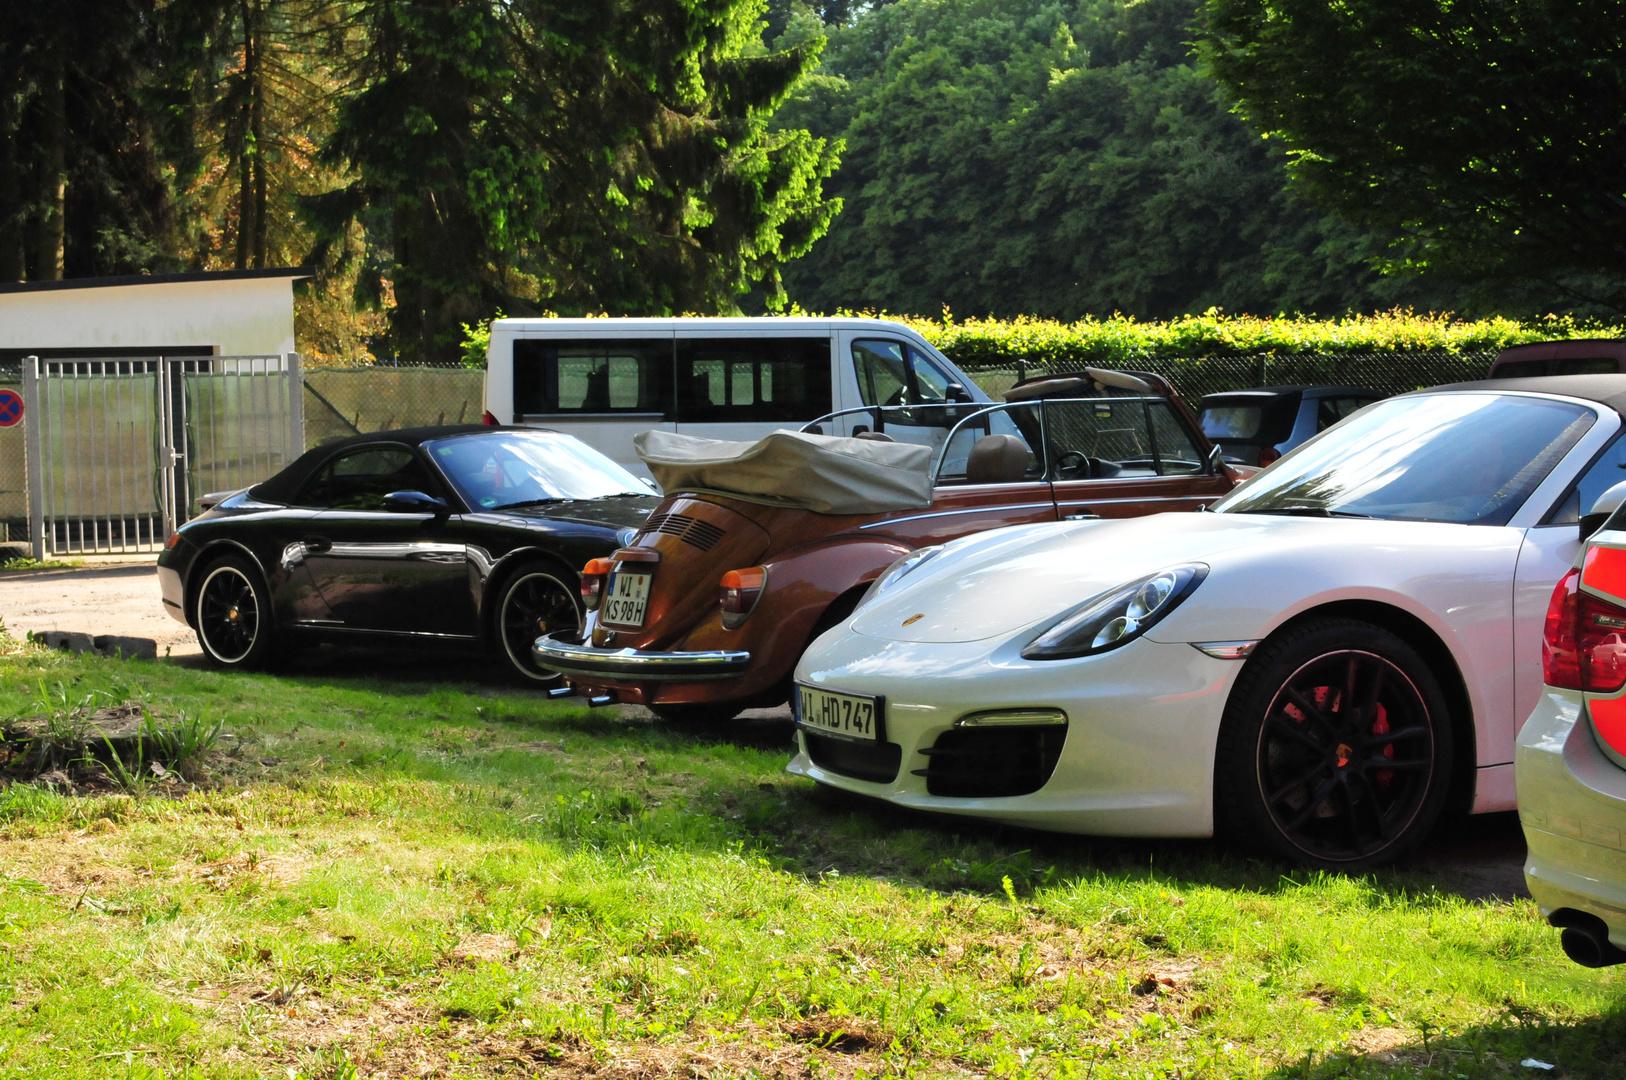 Schöne Autos :-)